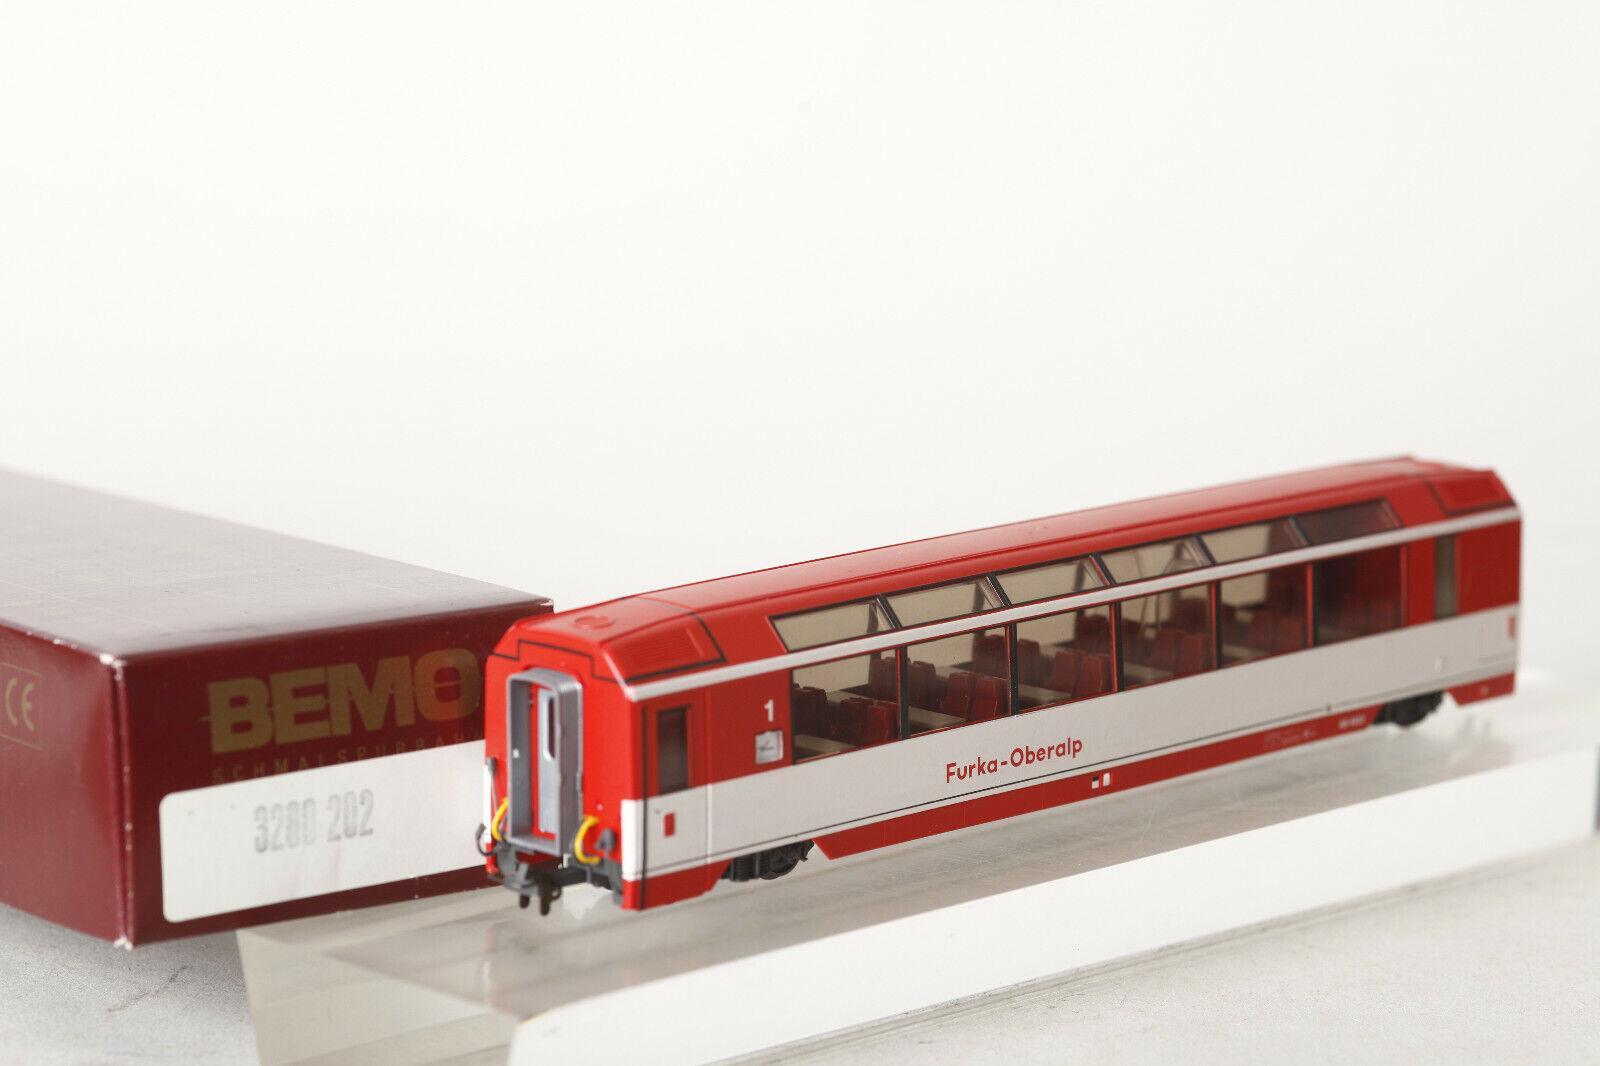 Bemo H0m Panoramawagen BVZ Furka - Oberalp  AS 4022 rot mit OVP (93893)